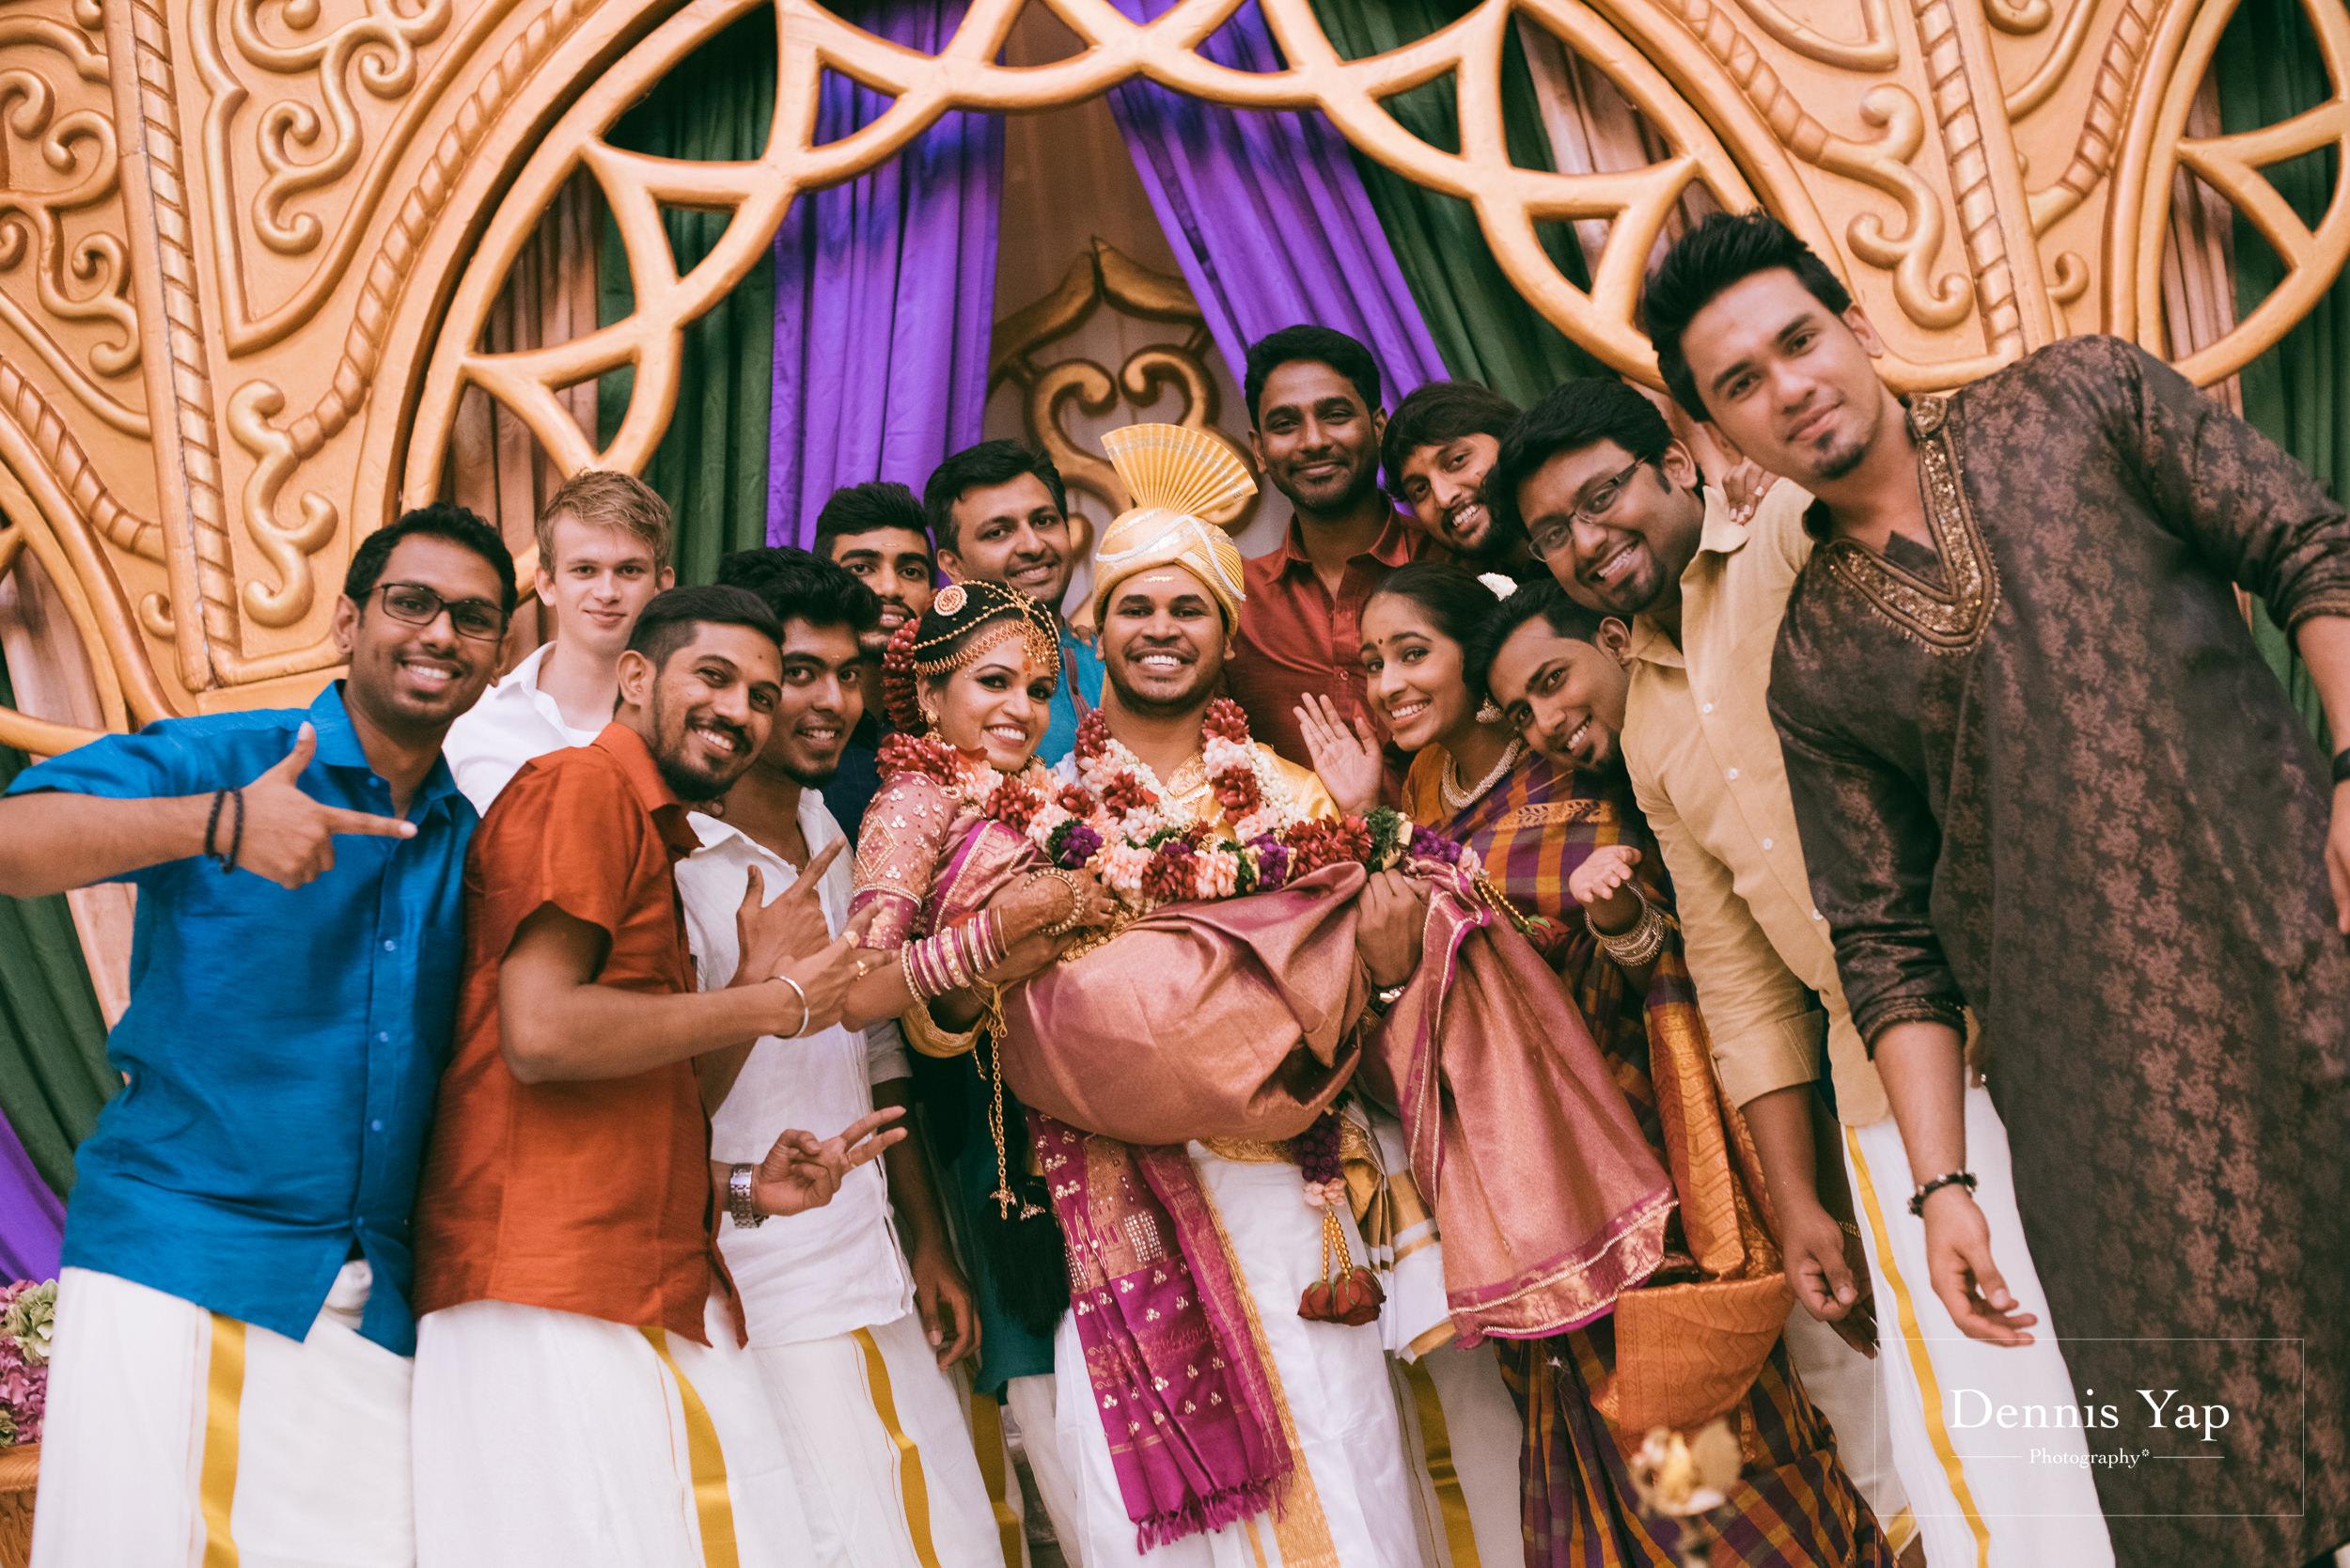 puvaneswaran cangitaa indian wedding ceremony ideal convention dennis yap photography malaysia-33.jpg